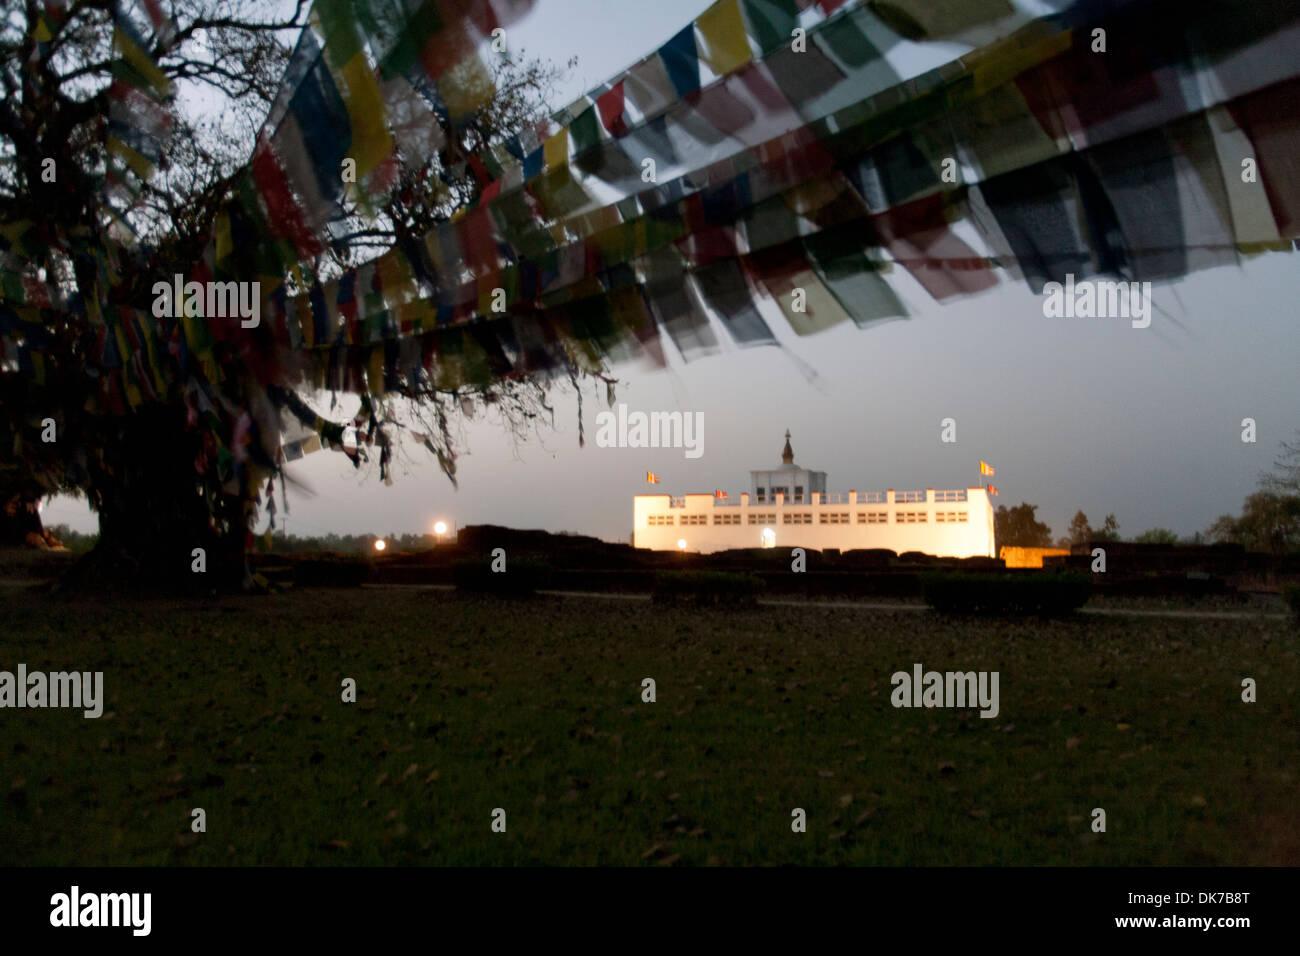 Maya Devi Temple, the Birthplace of the Lord Buddha, Lumbini, Nepal - Stock Image